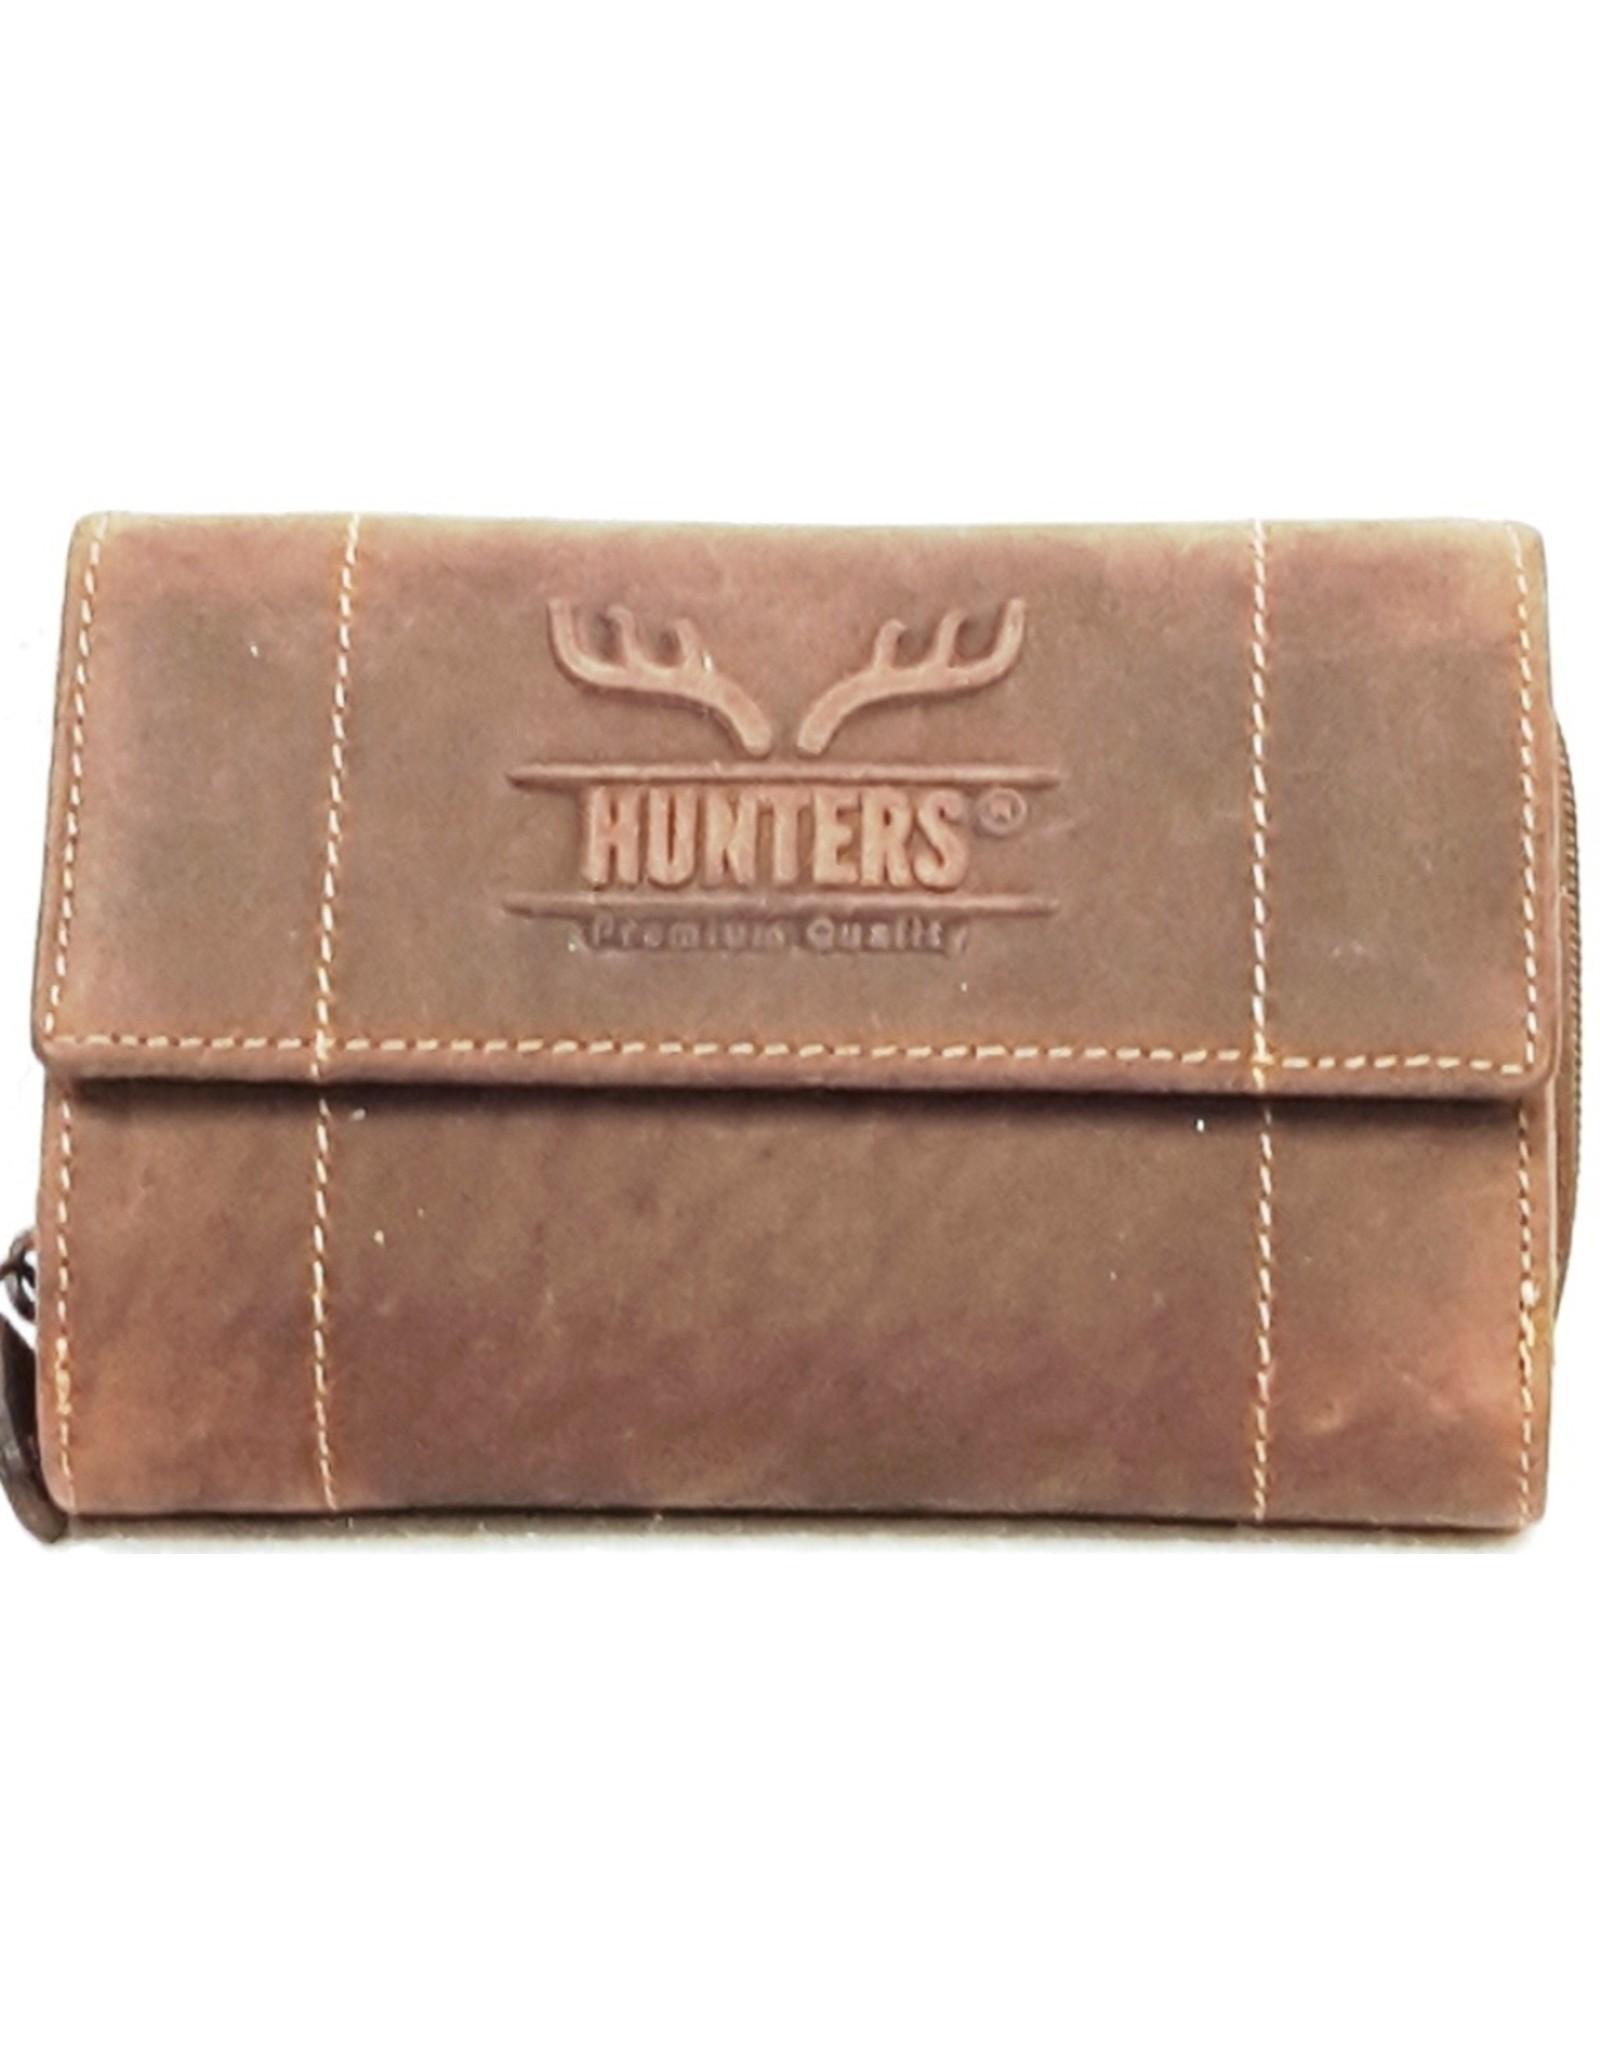 Hunters Leather Wallets -  Leather wallet Hunters - Unisex dark brown